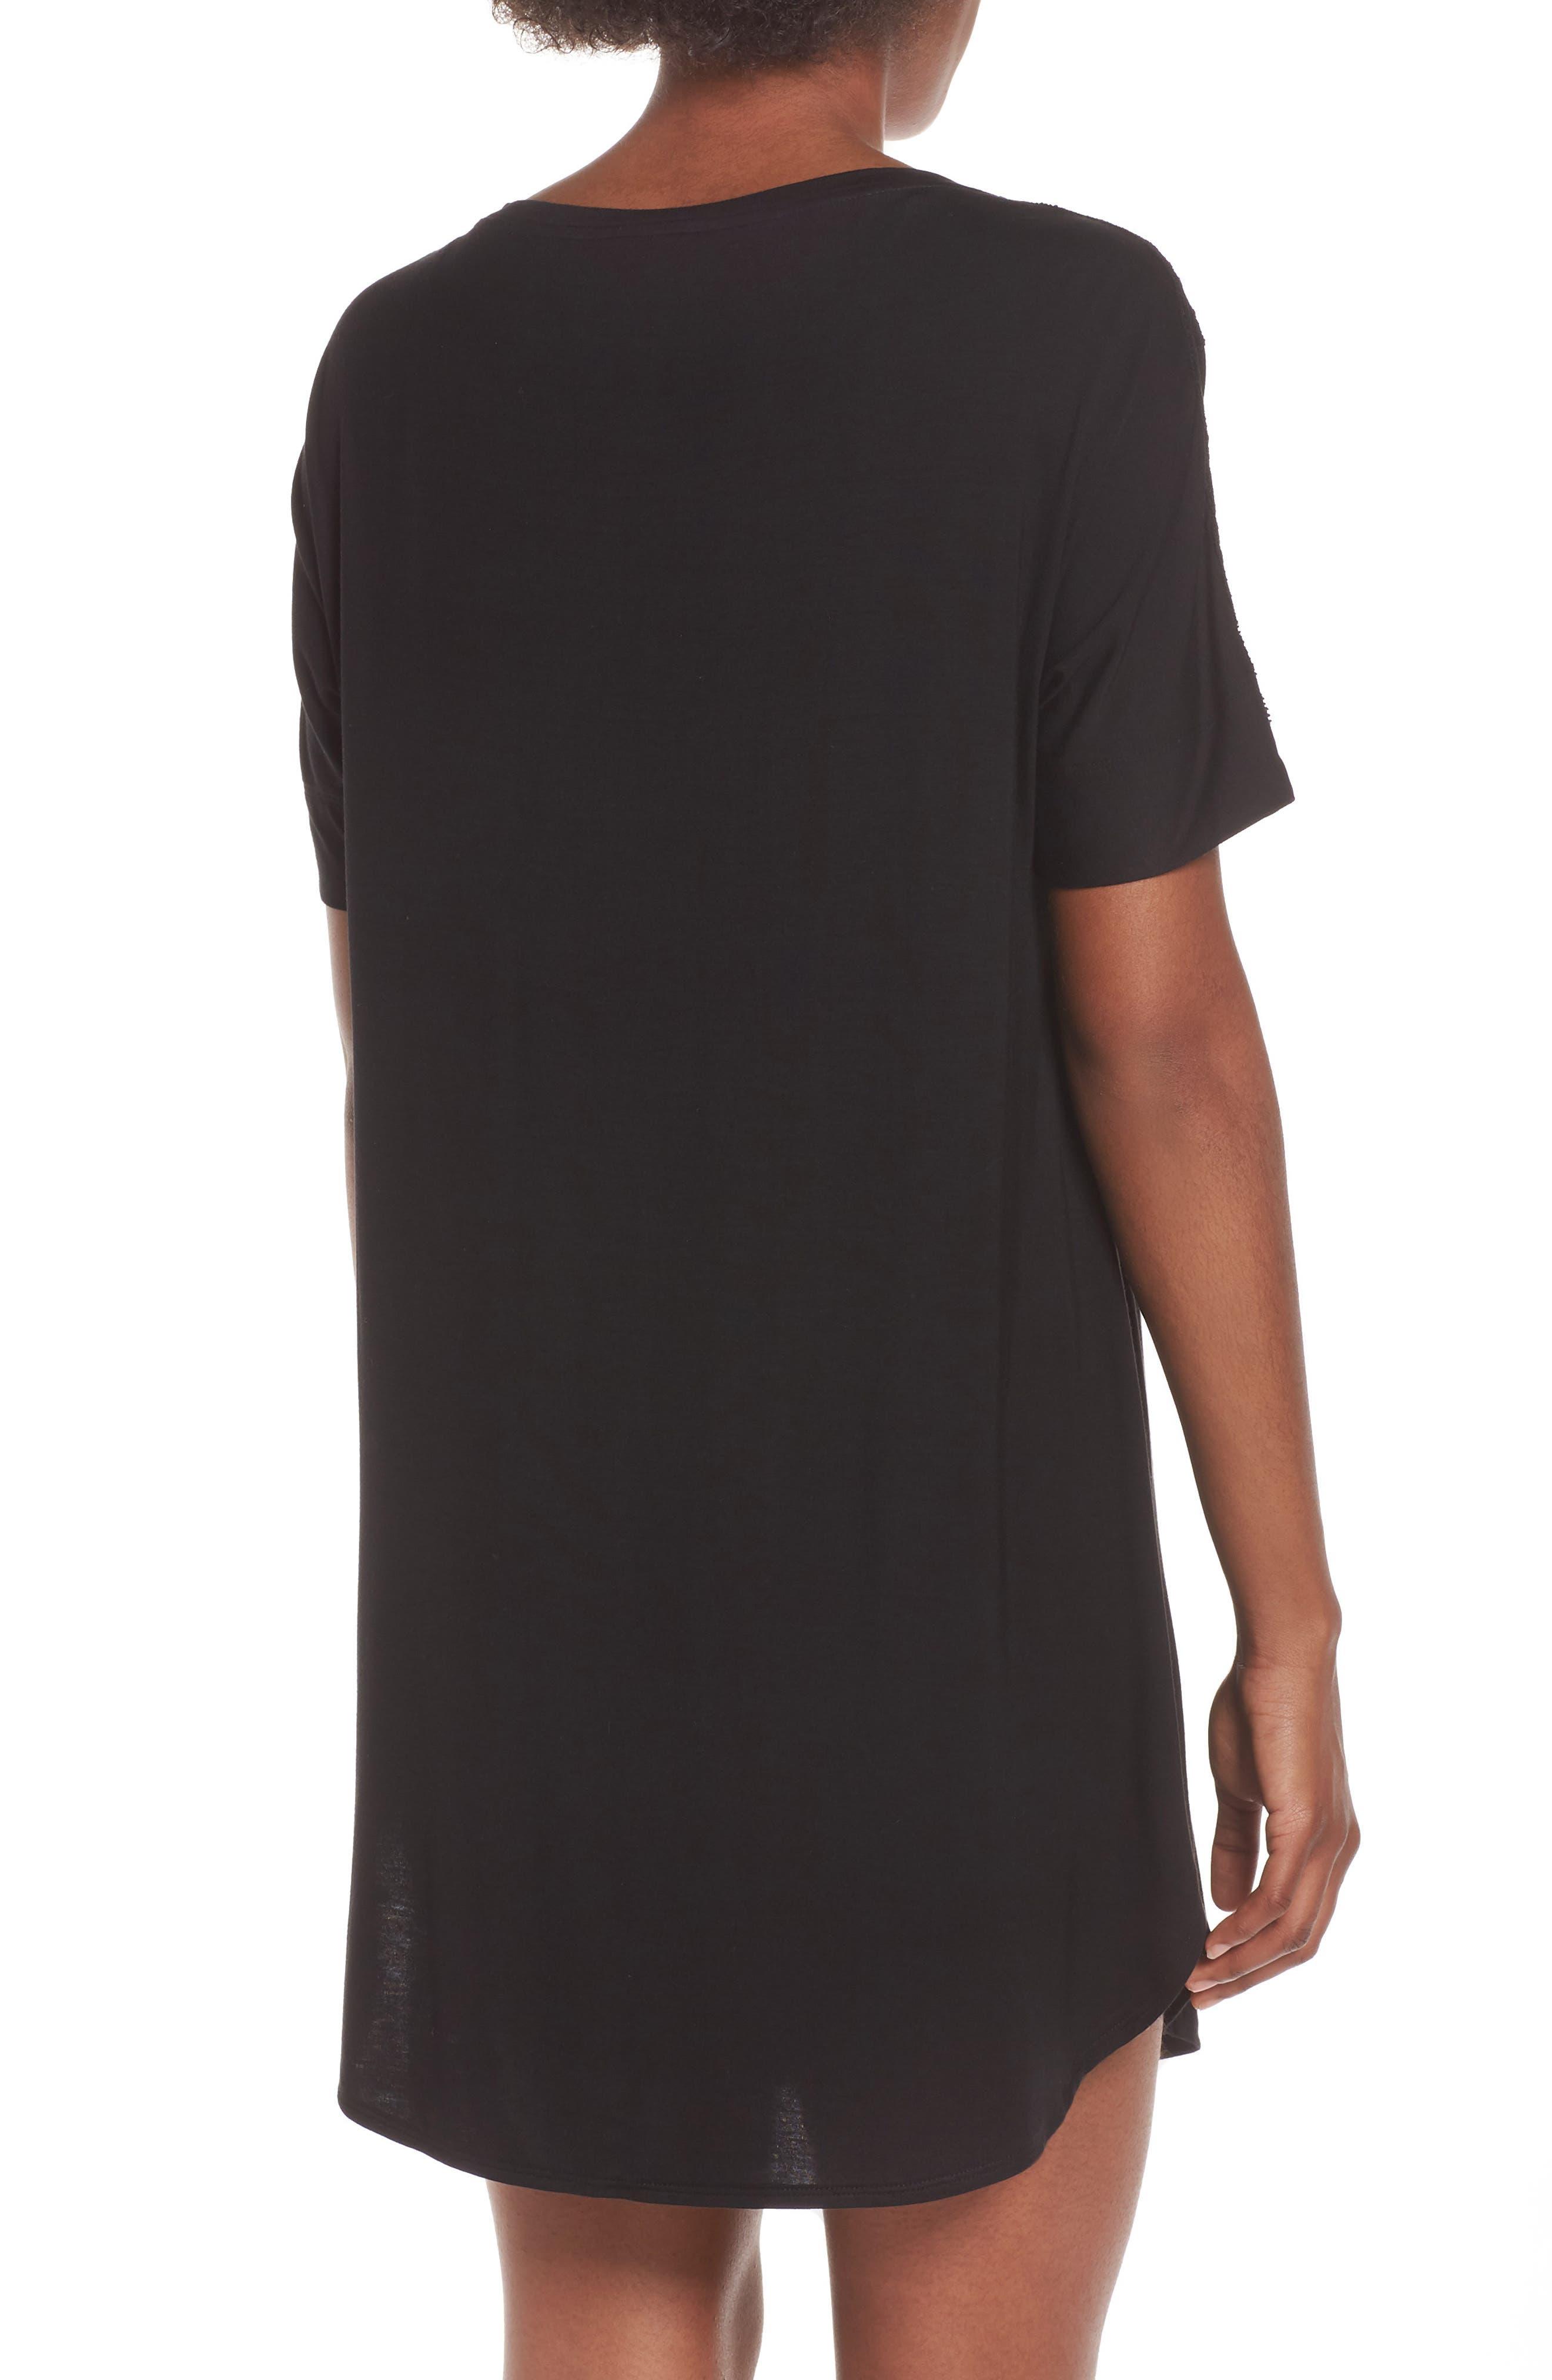 NATORI,                             Feathers Essential Sleep Shirt,                             Alternate thumbnail 2, color,                             BLACK